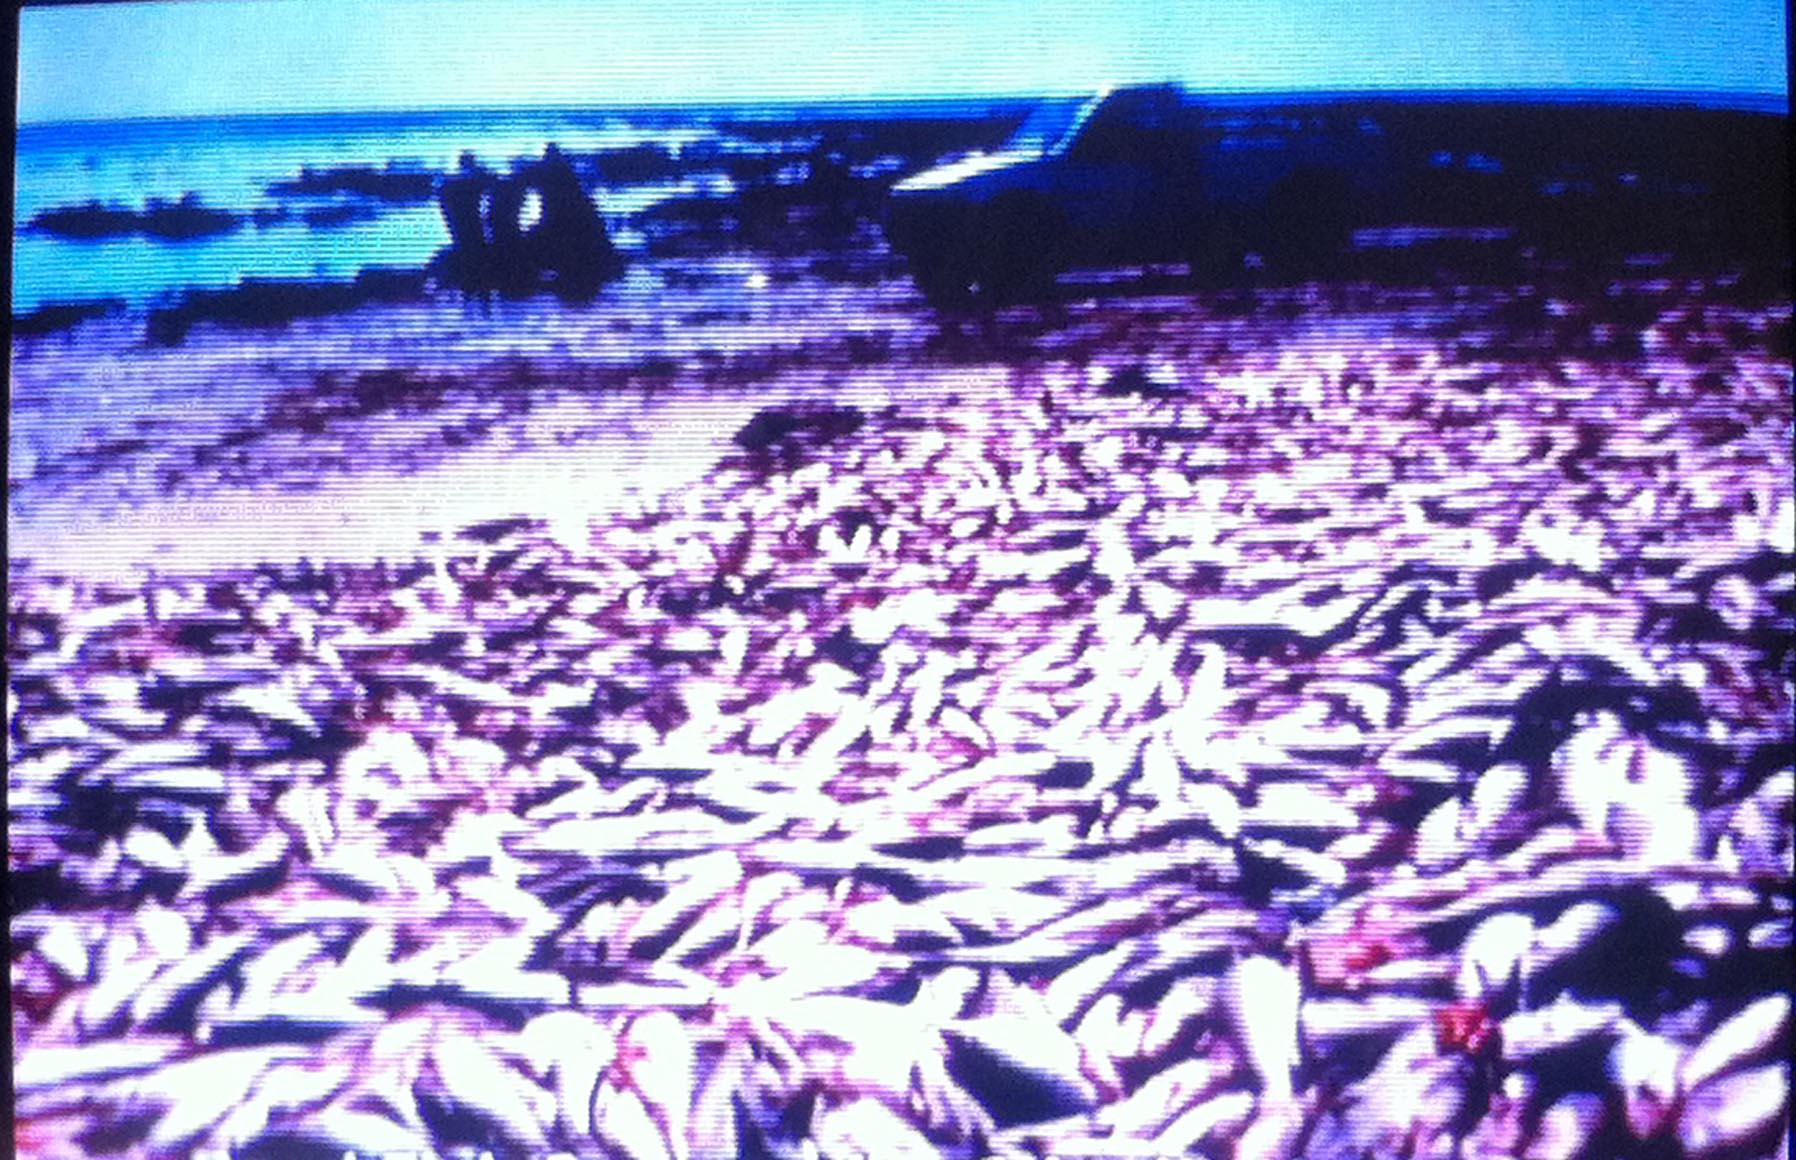 Dee finney 39 s blog september 29 2013 page 570 john for Pacific ocean radiation fish